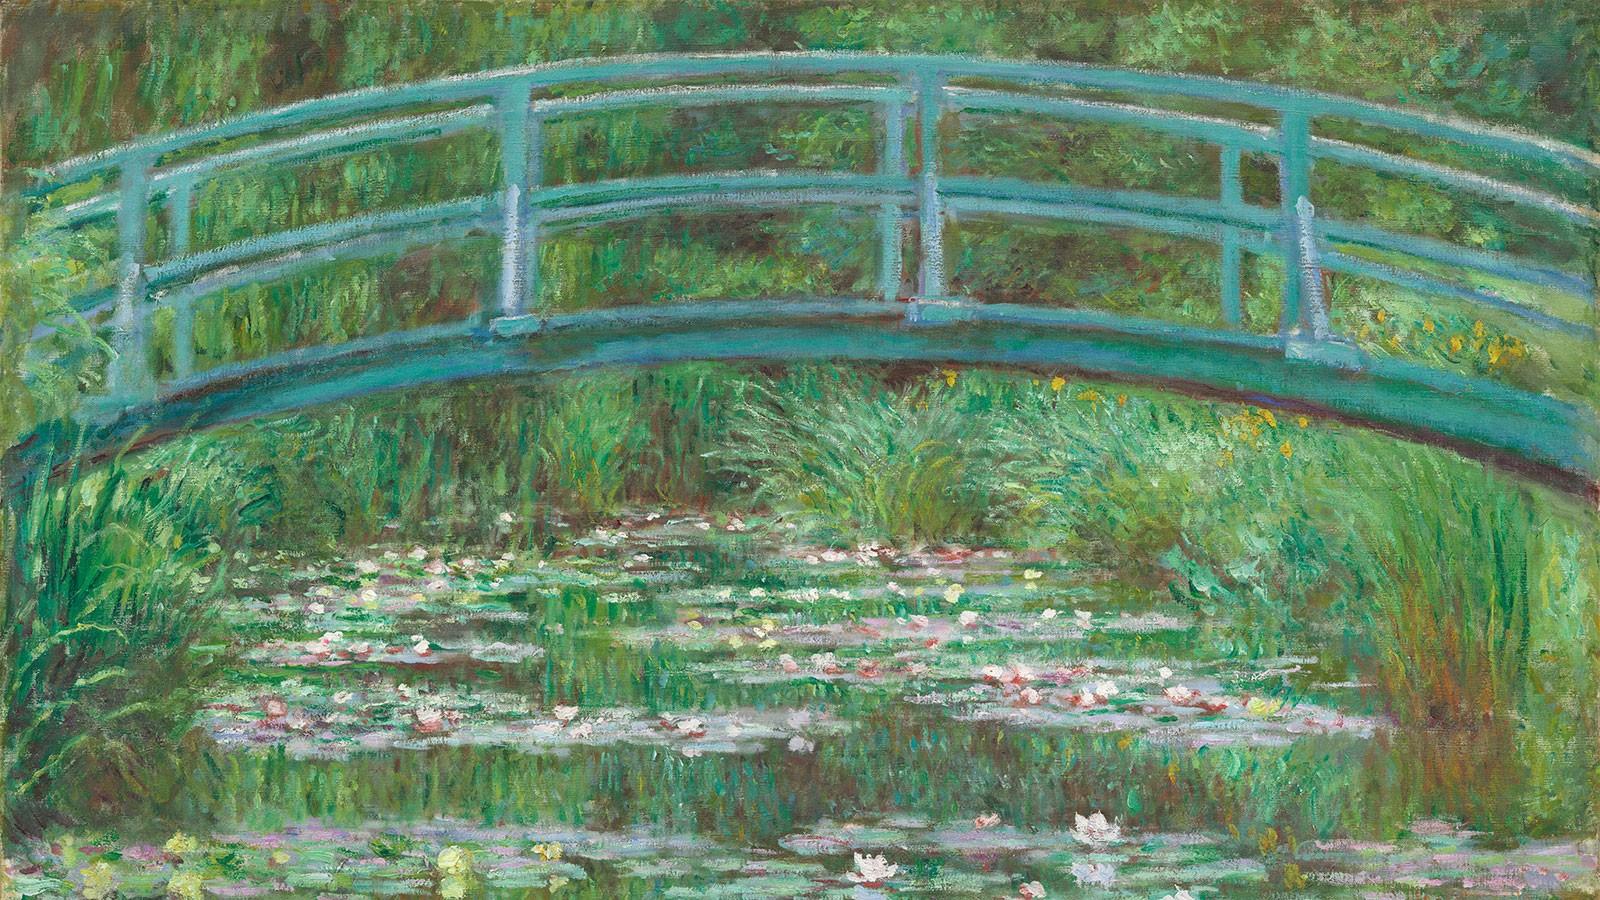 1600x900 Px Artwork Bridge Classic Art Claude Monet Painting Water Lilies